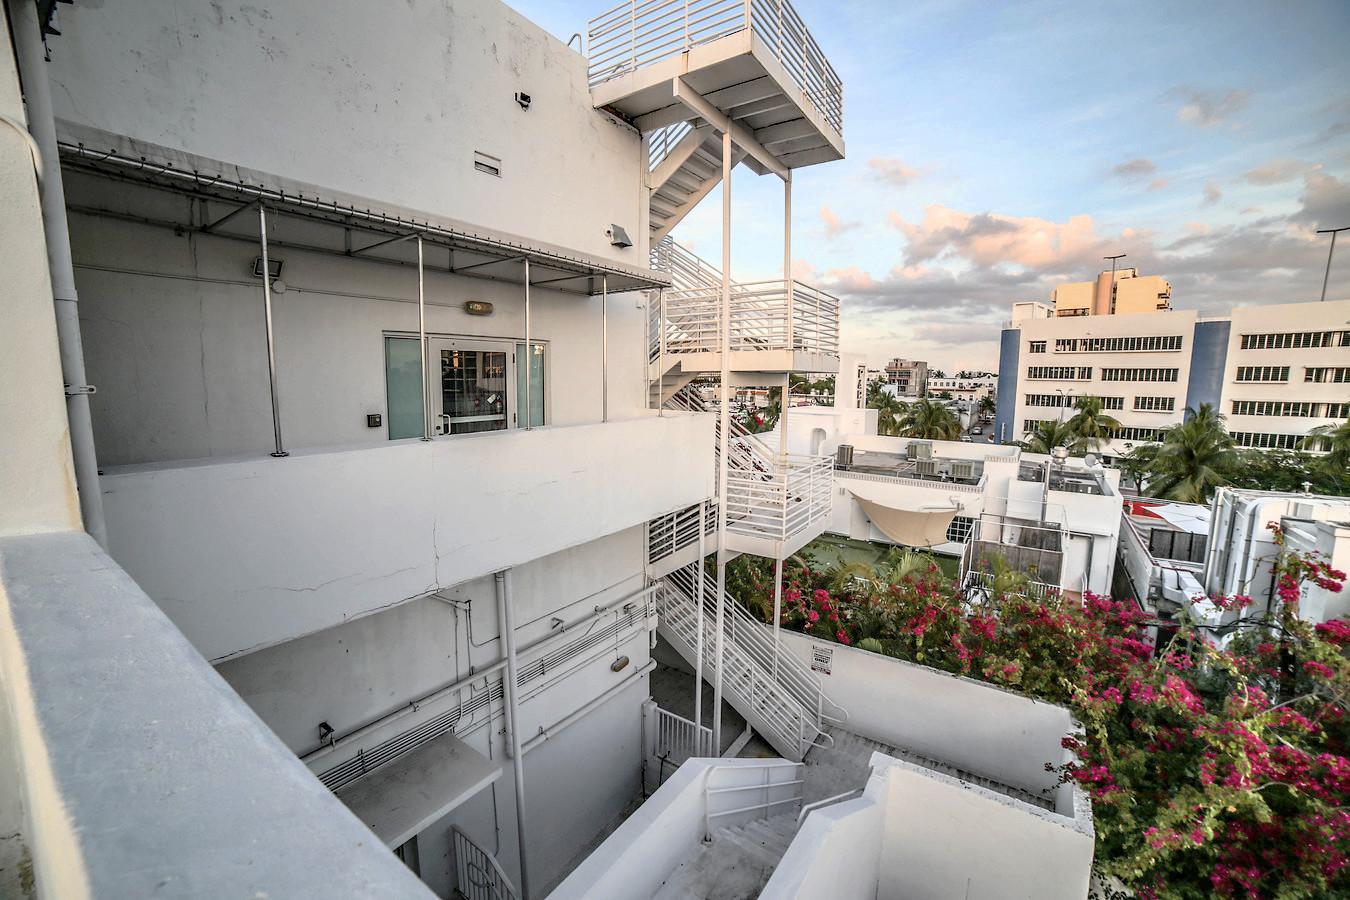 Paris Theater Miami Beach - Venue Rental - Photography Video Studios